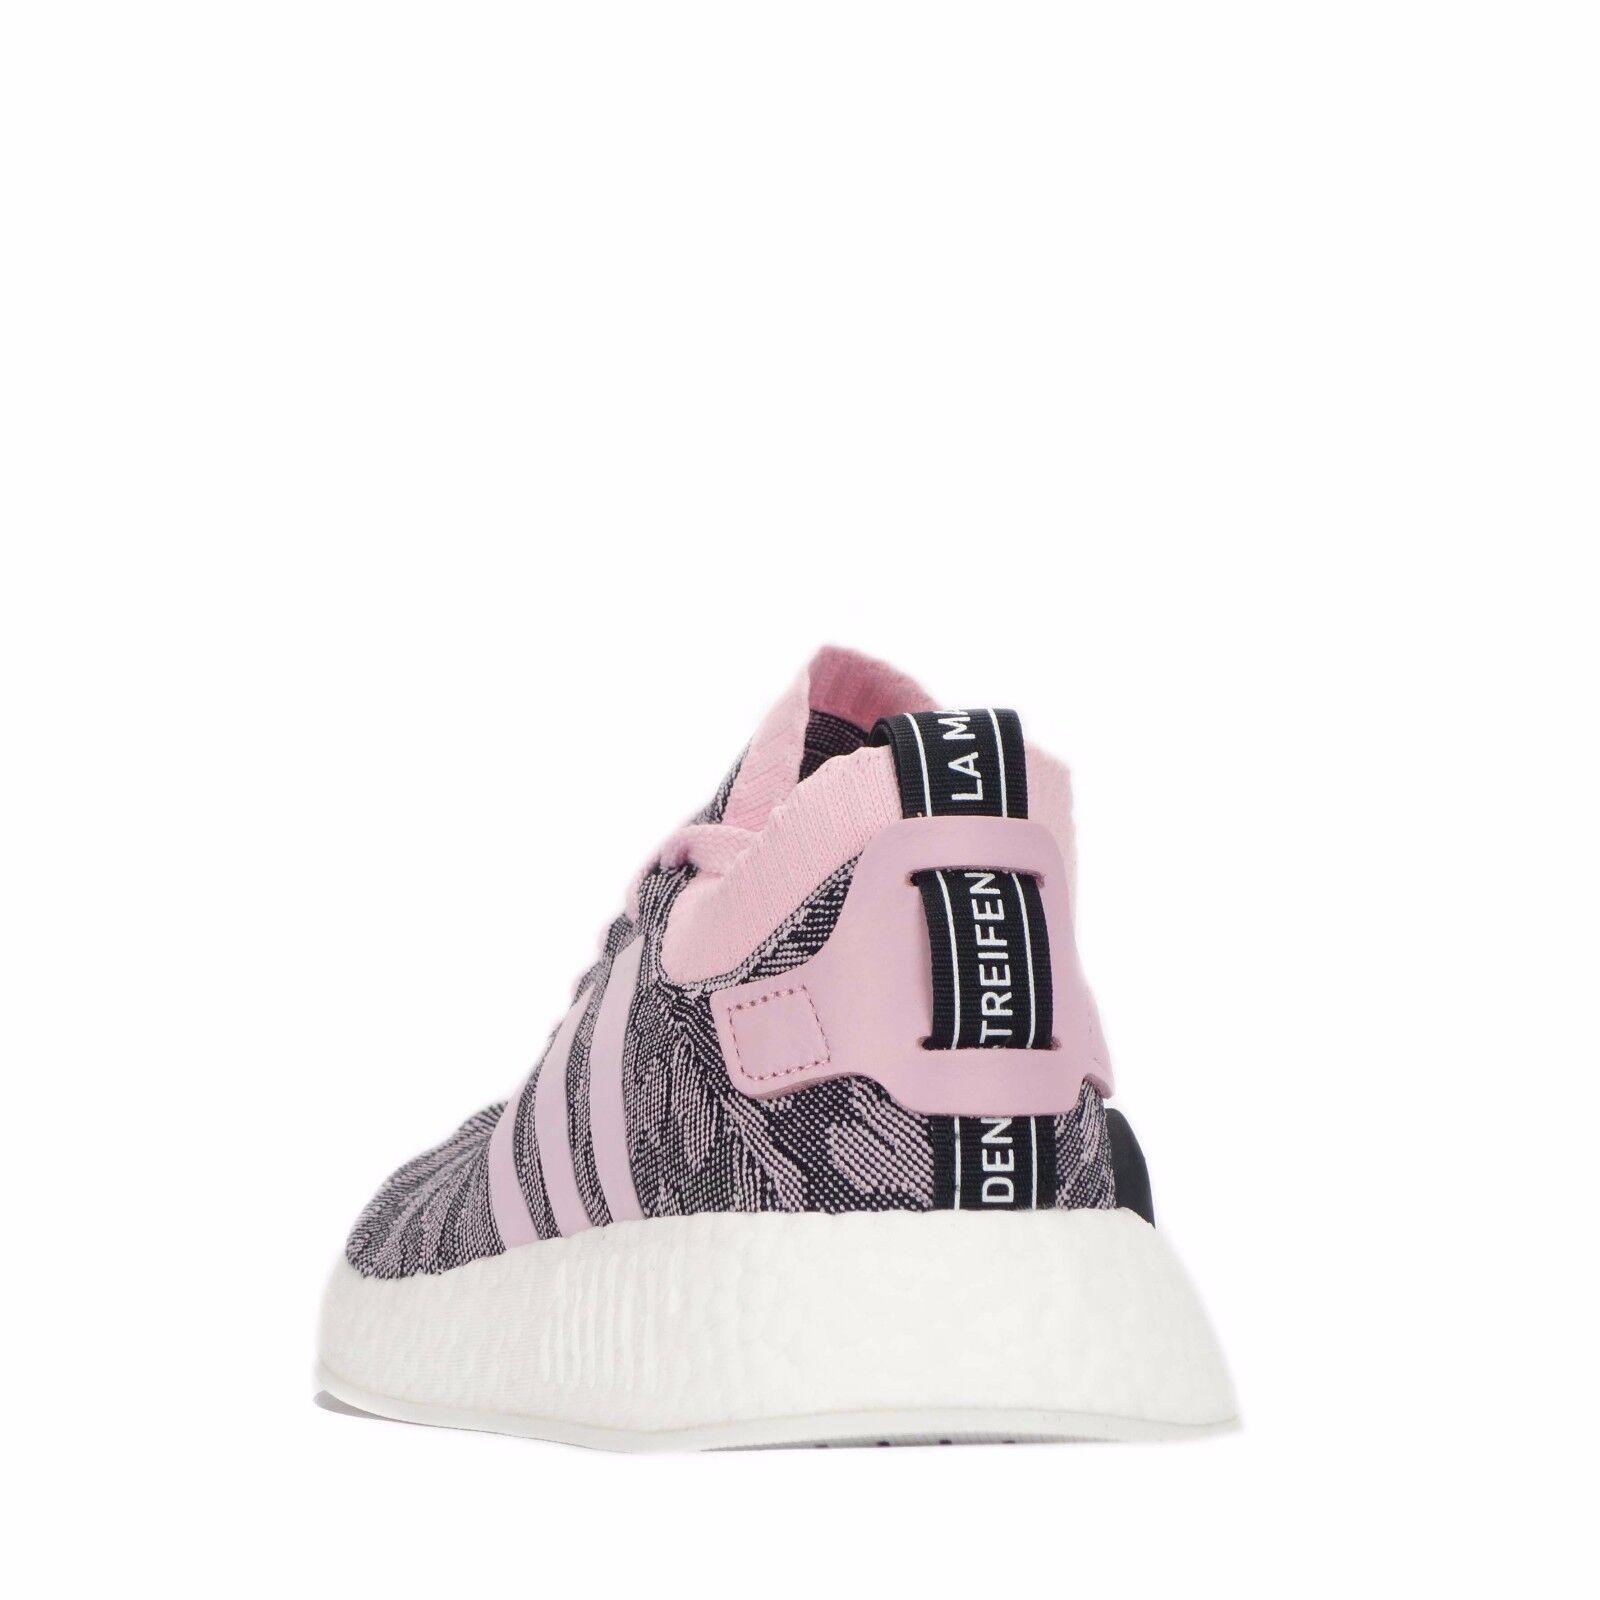 adidas Originals NMD_R2 Primeknit Wonder femmes  Shoes Wonder Primeknit Pink d76587